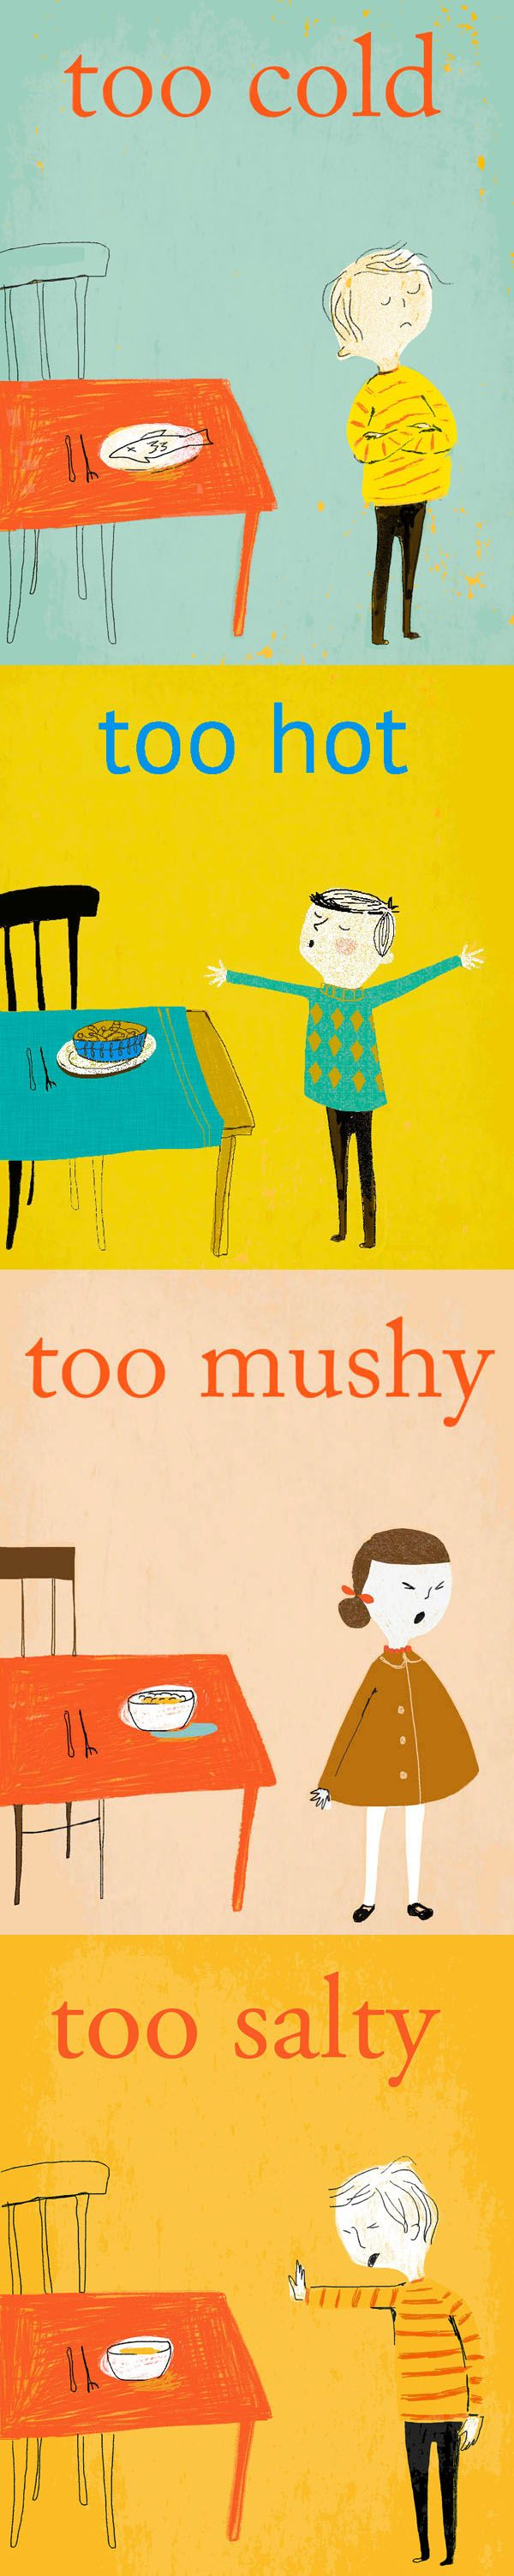 Samantha Cotterill, childern, illustration, funny, colour, retro, too cold, food, editorial, design